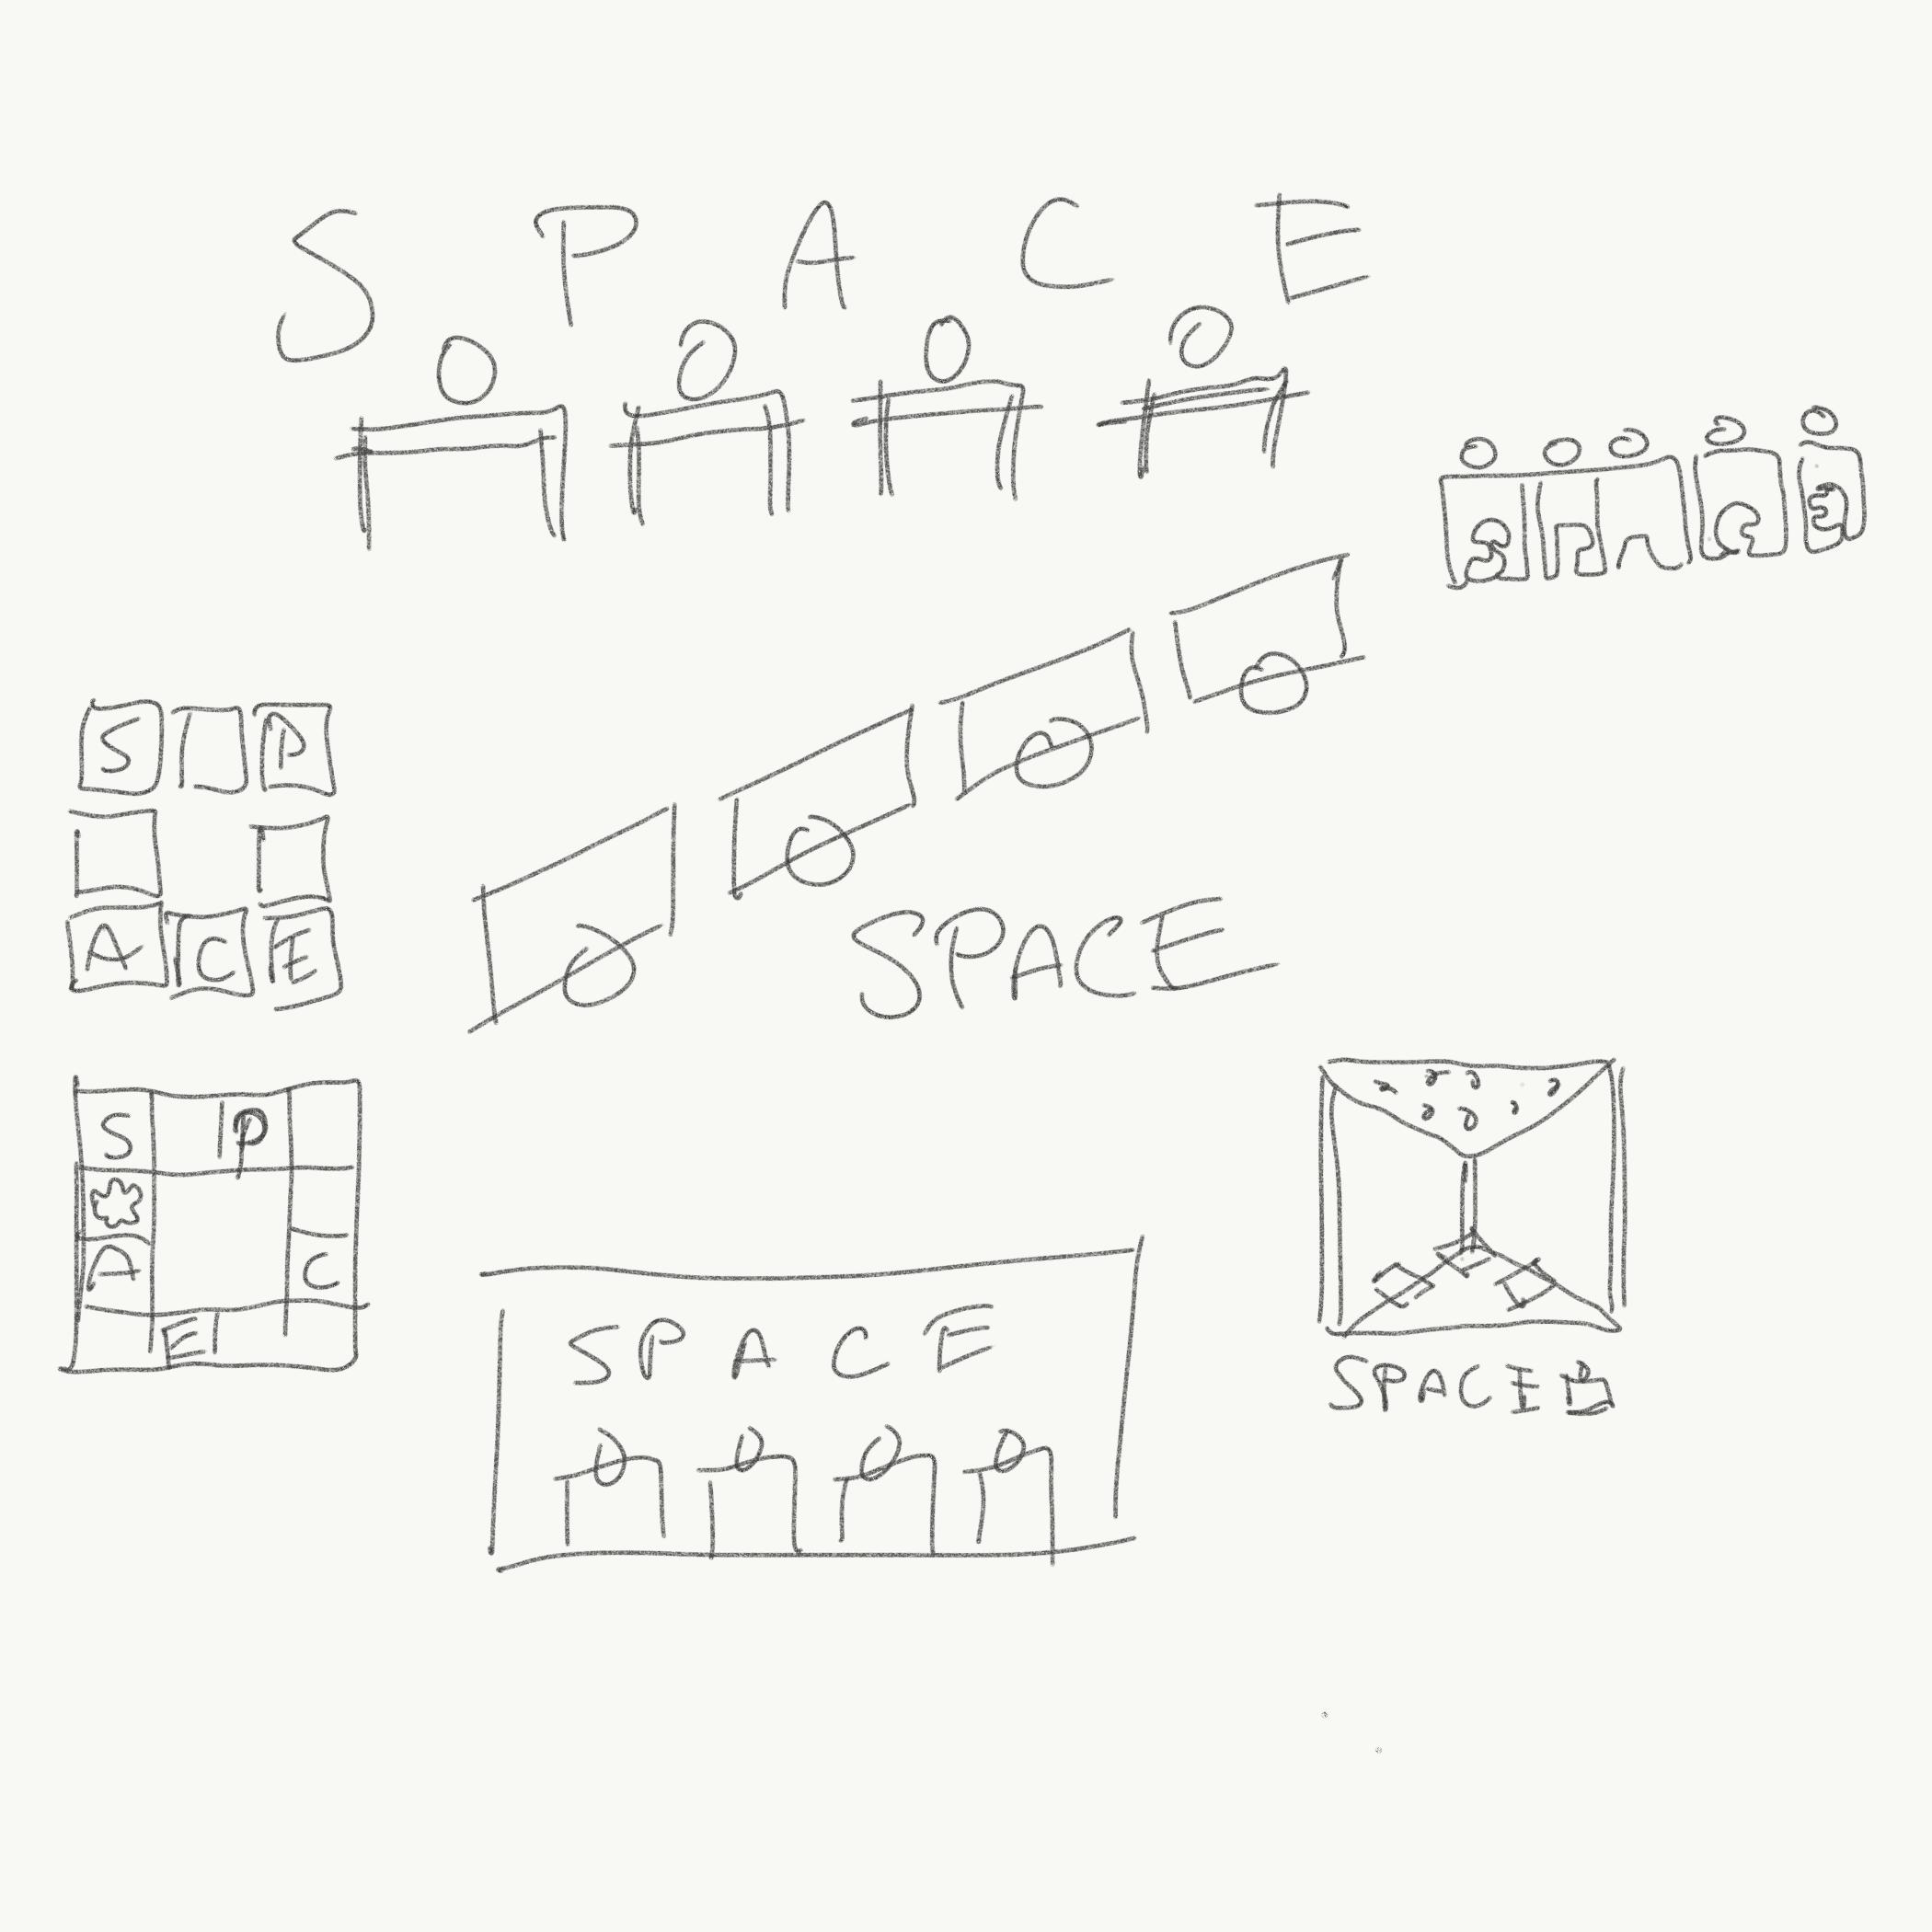 space logo doodles